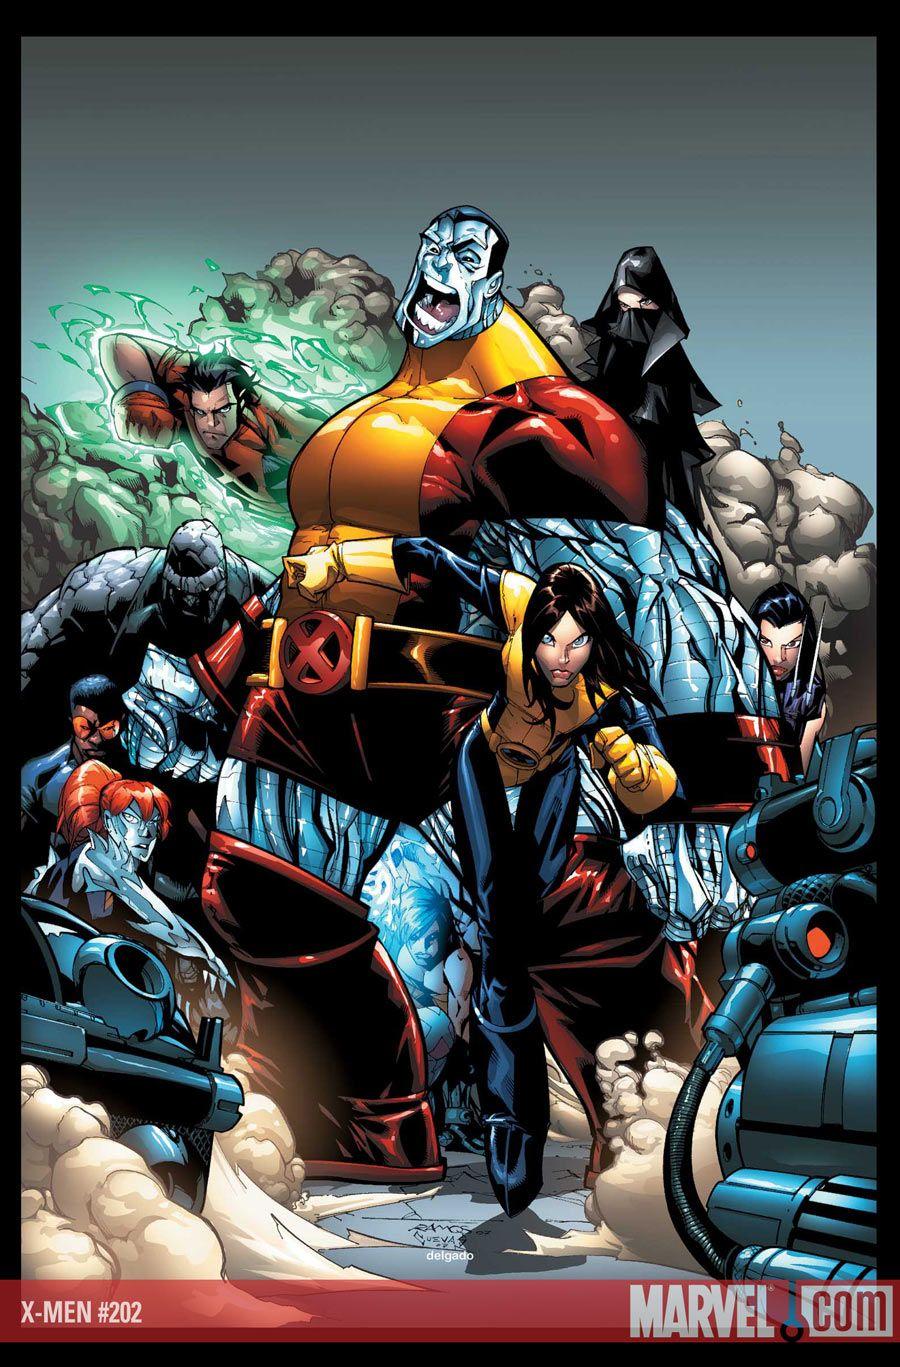 X-MEN  Looks like dust, hellion, collosus, x23, and shadowcat are